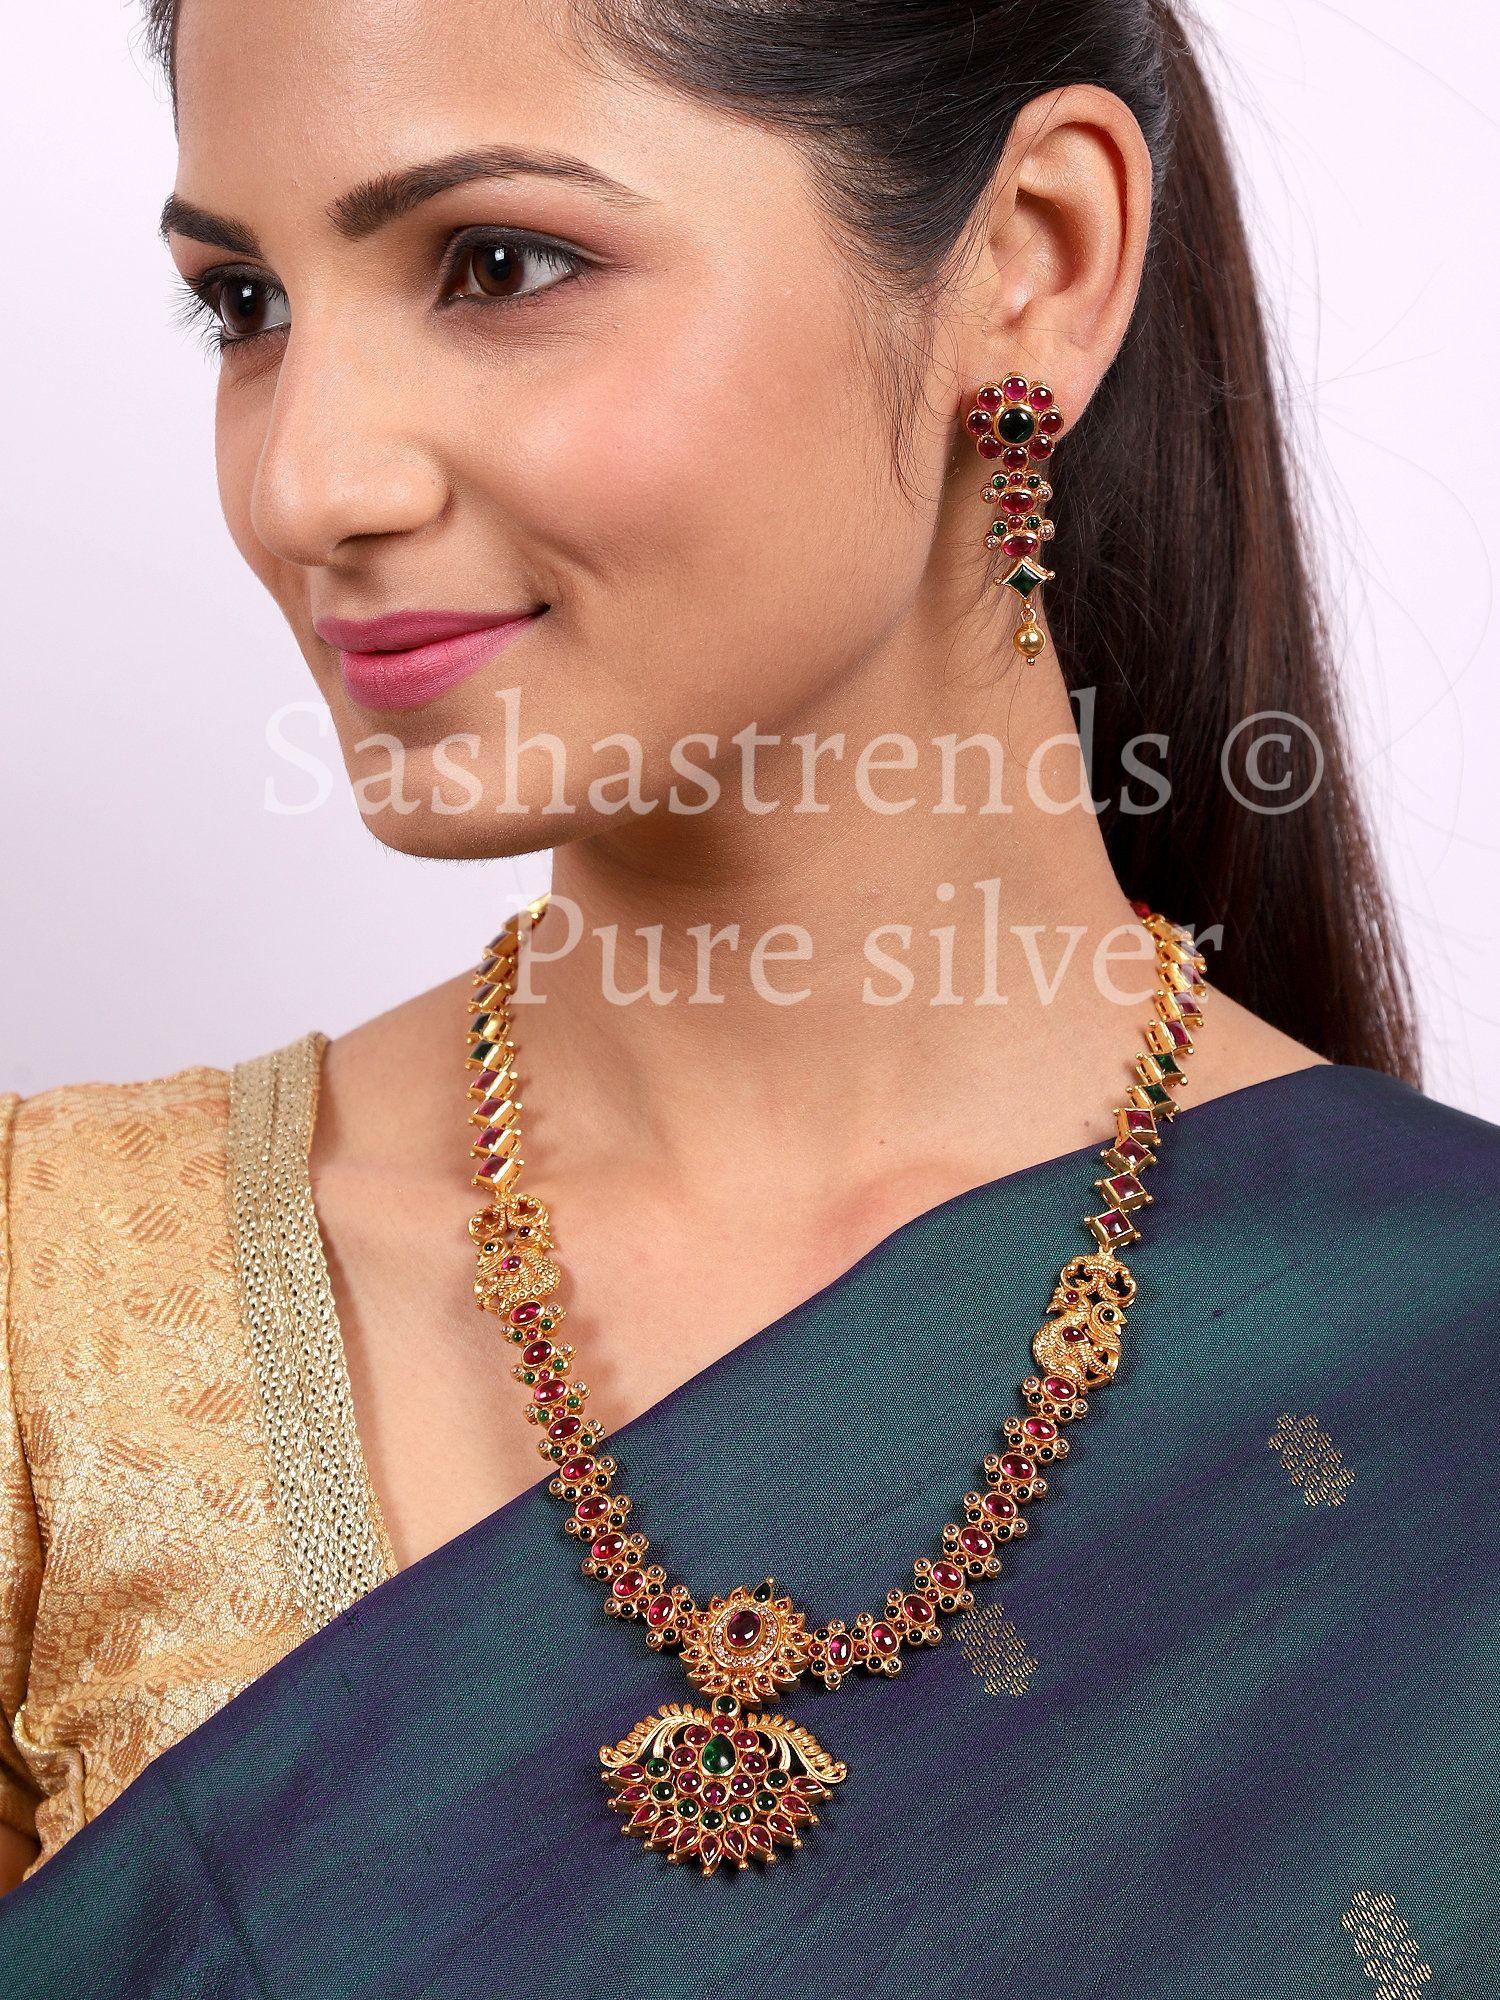 indian traditional jewelry silver kemp stone jewelry temple jewelry Pure silver earrings 925 silver jewelry